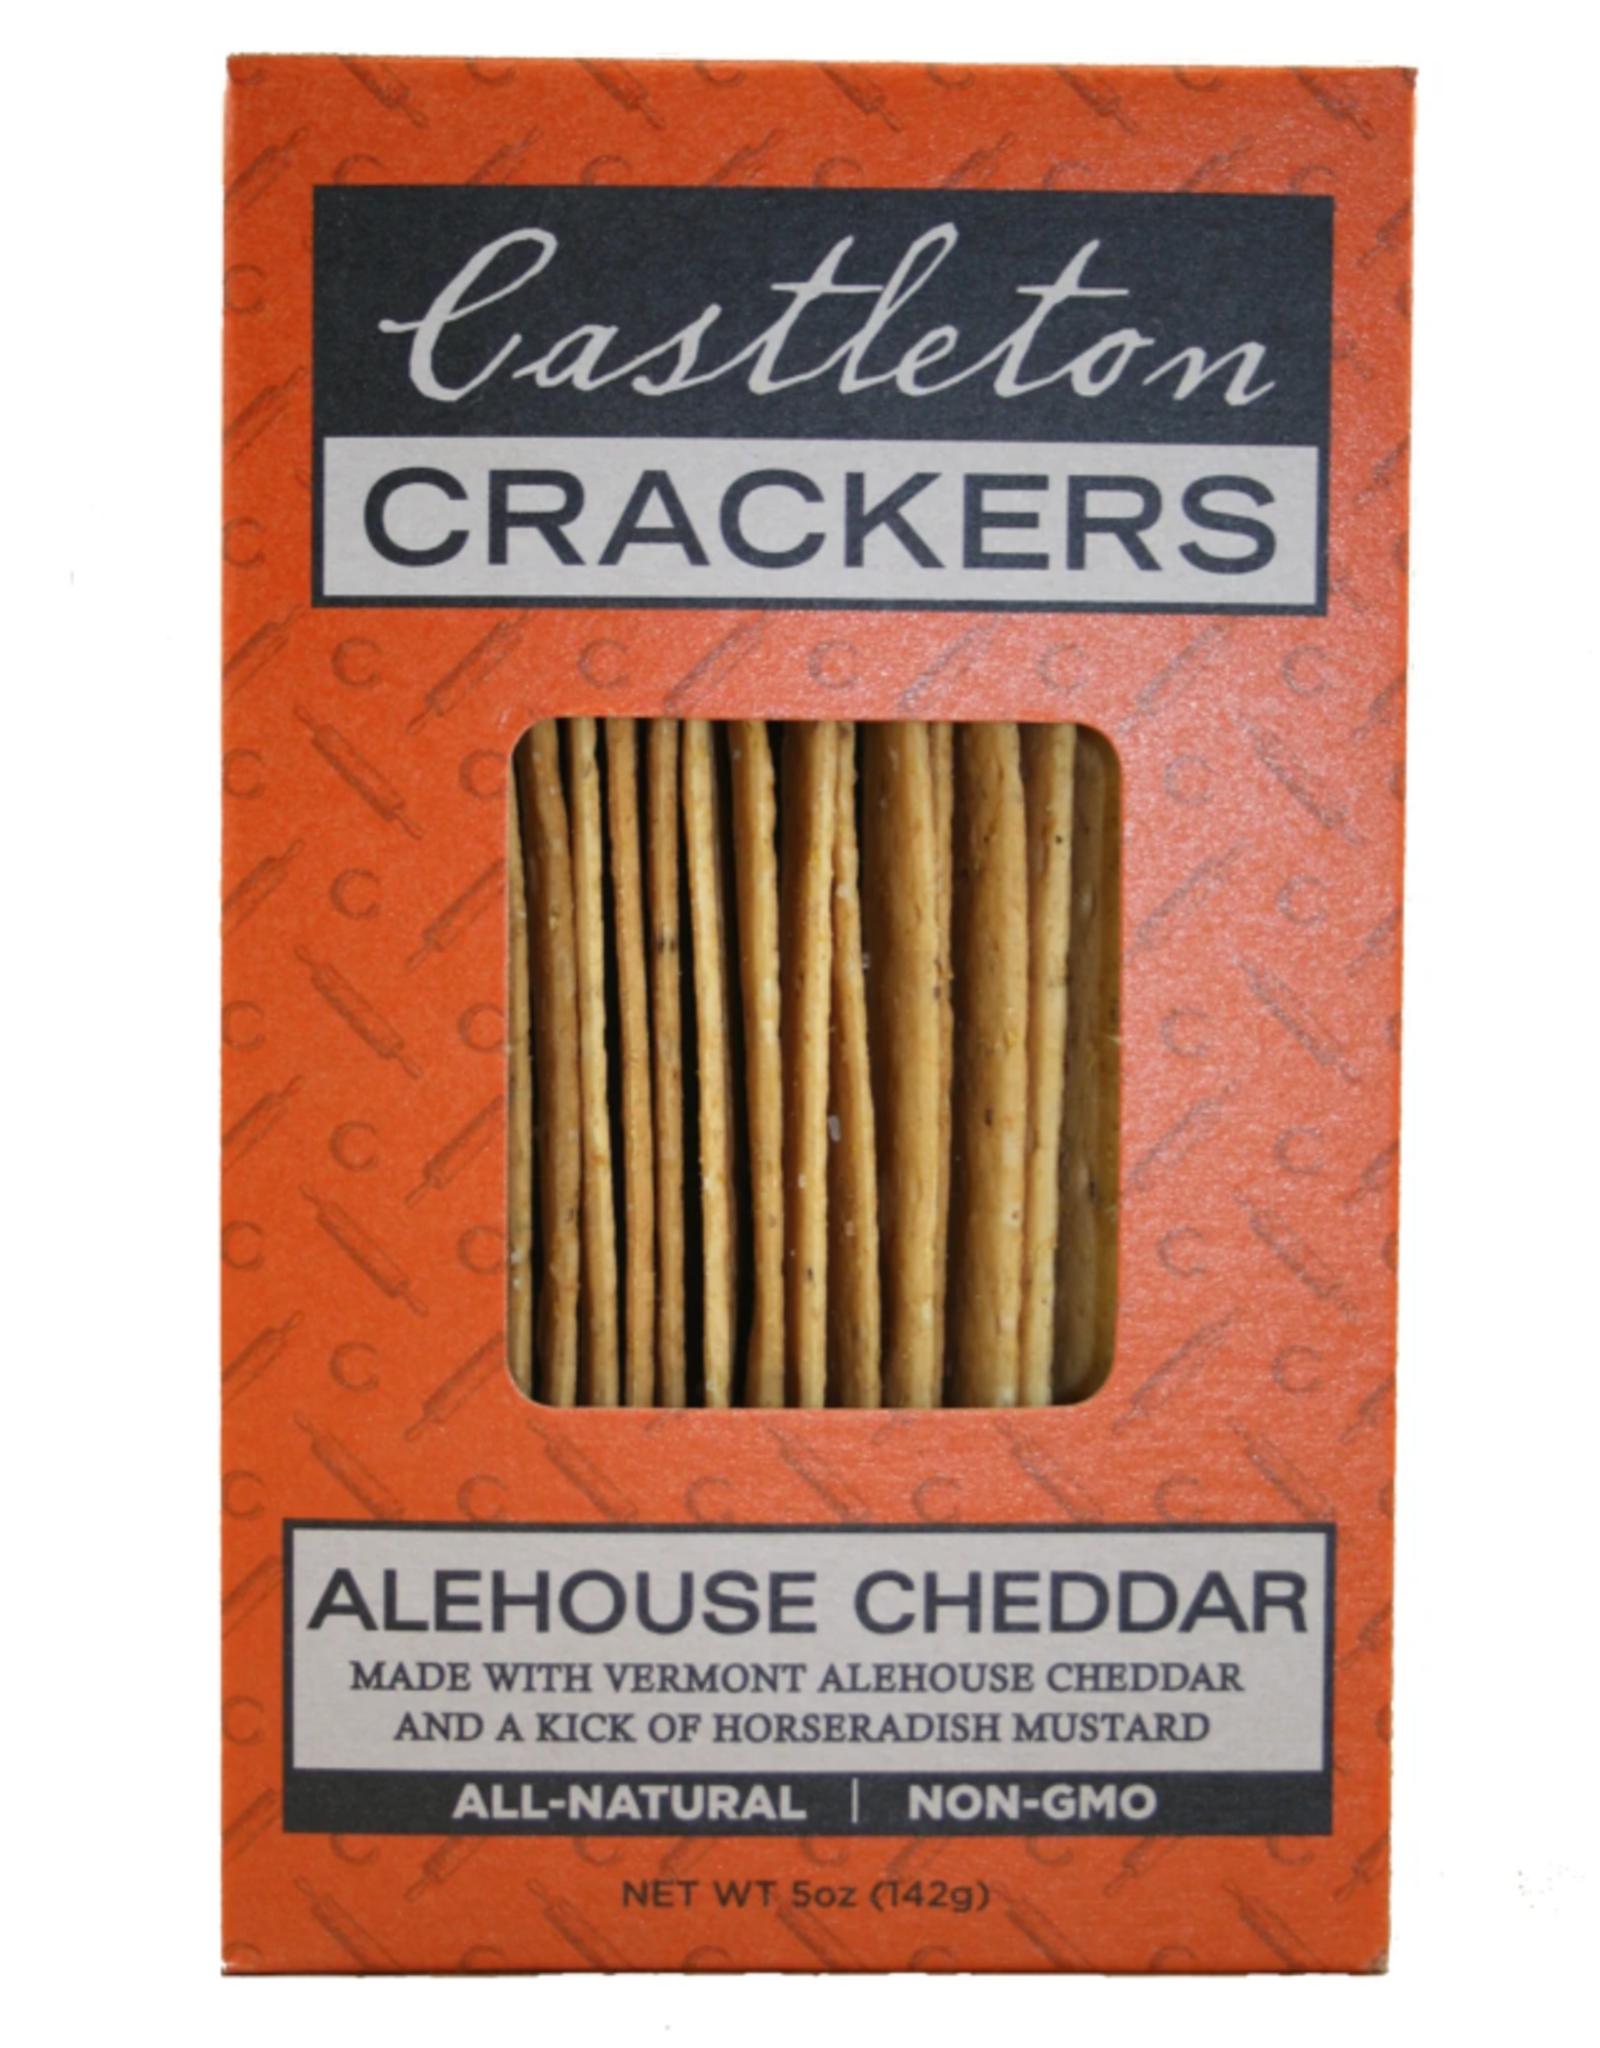 Merrill Foods Castleton Crackers, Alehouse Cheddar